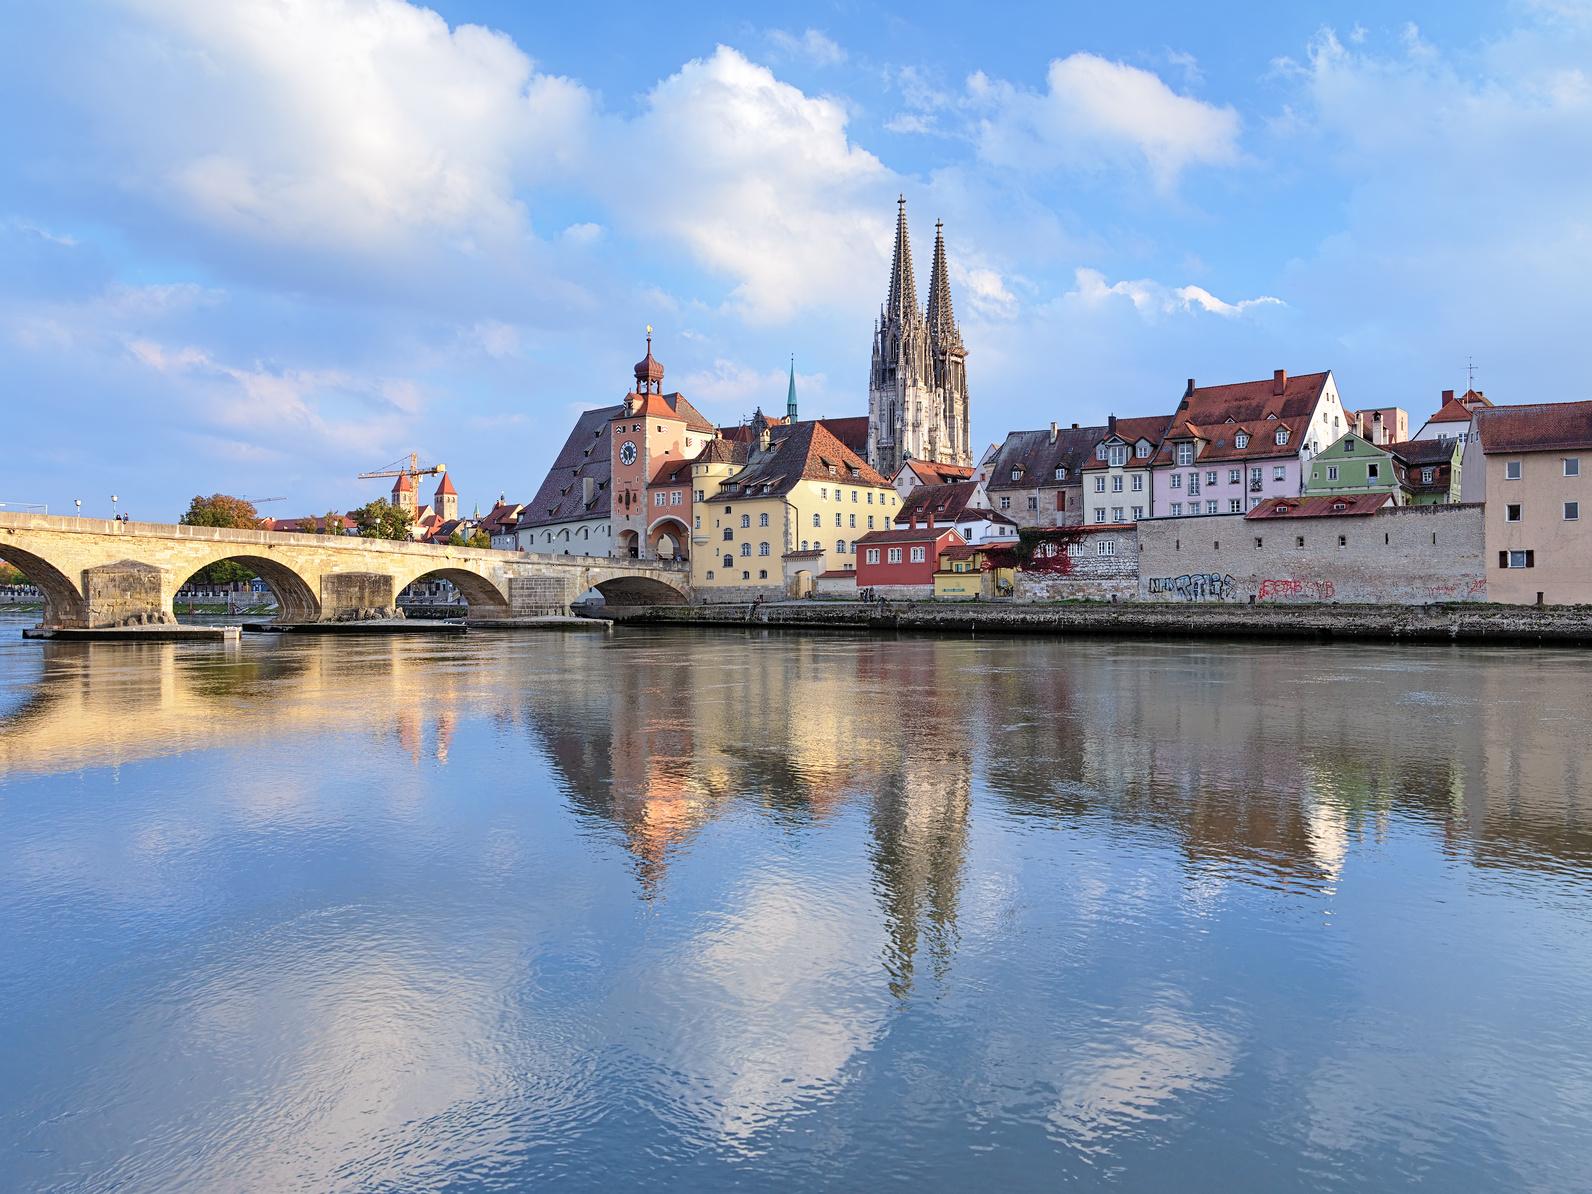 Altstadt Regensburg: steinerne Brücke